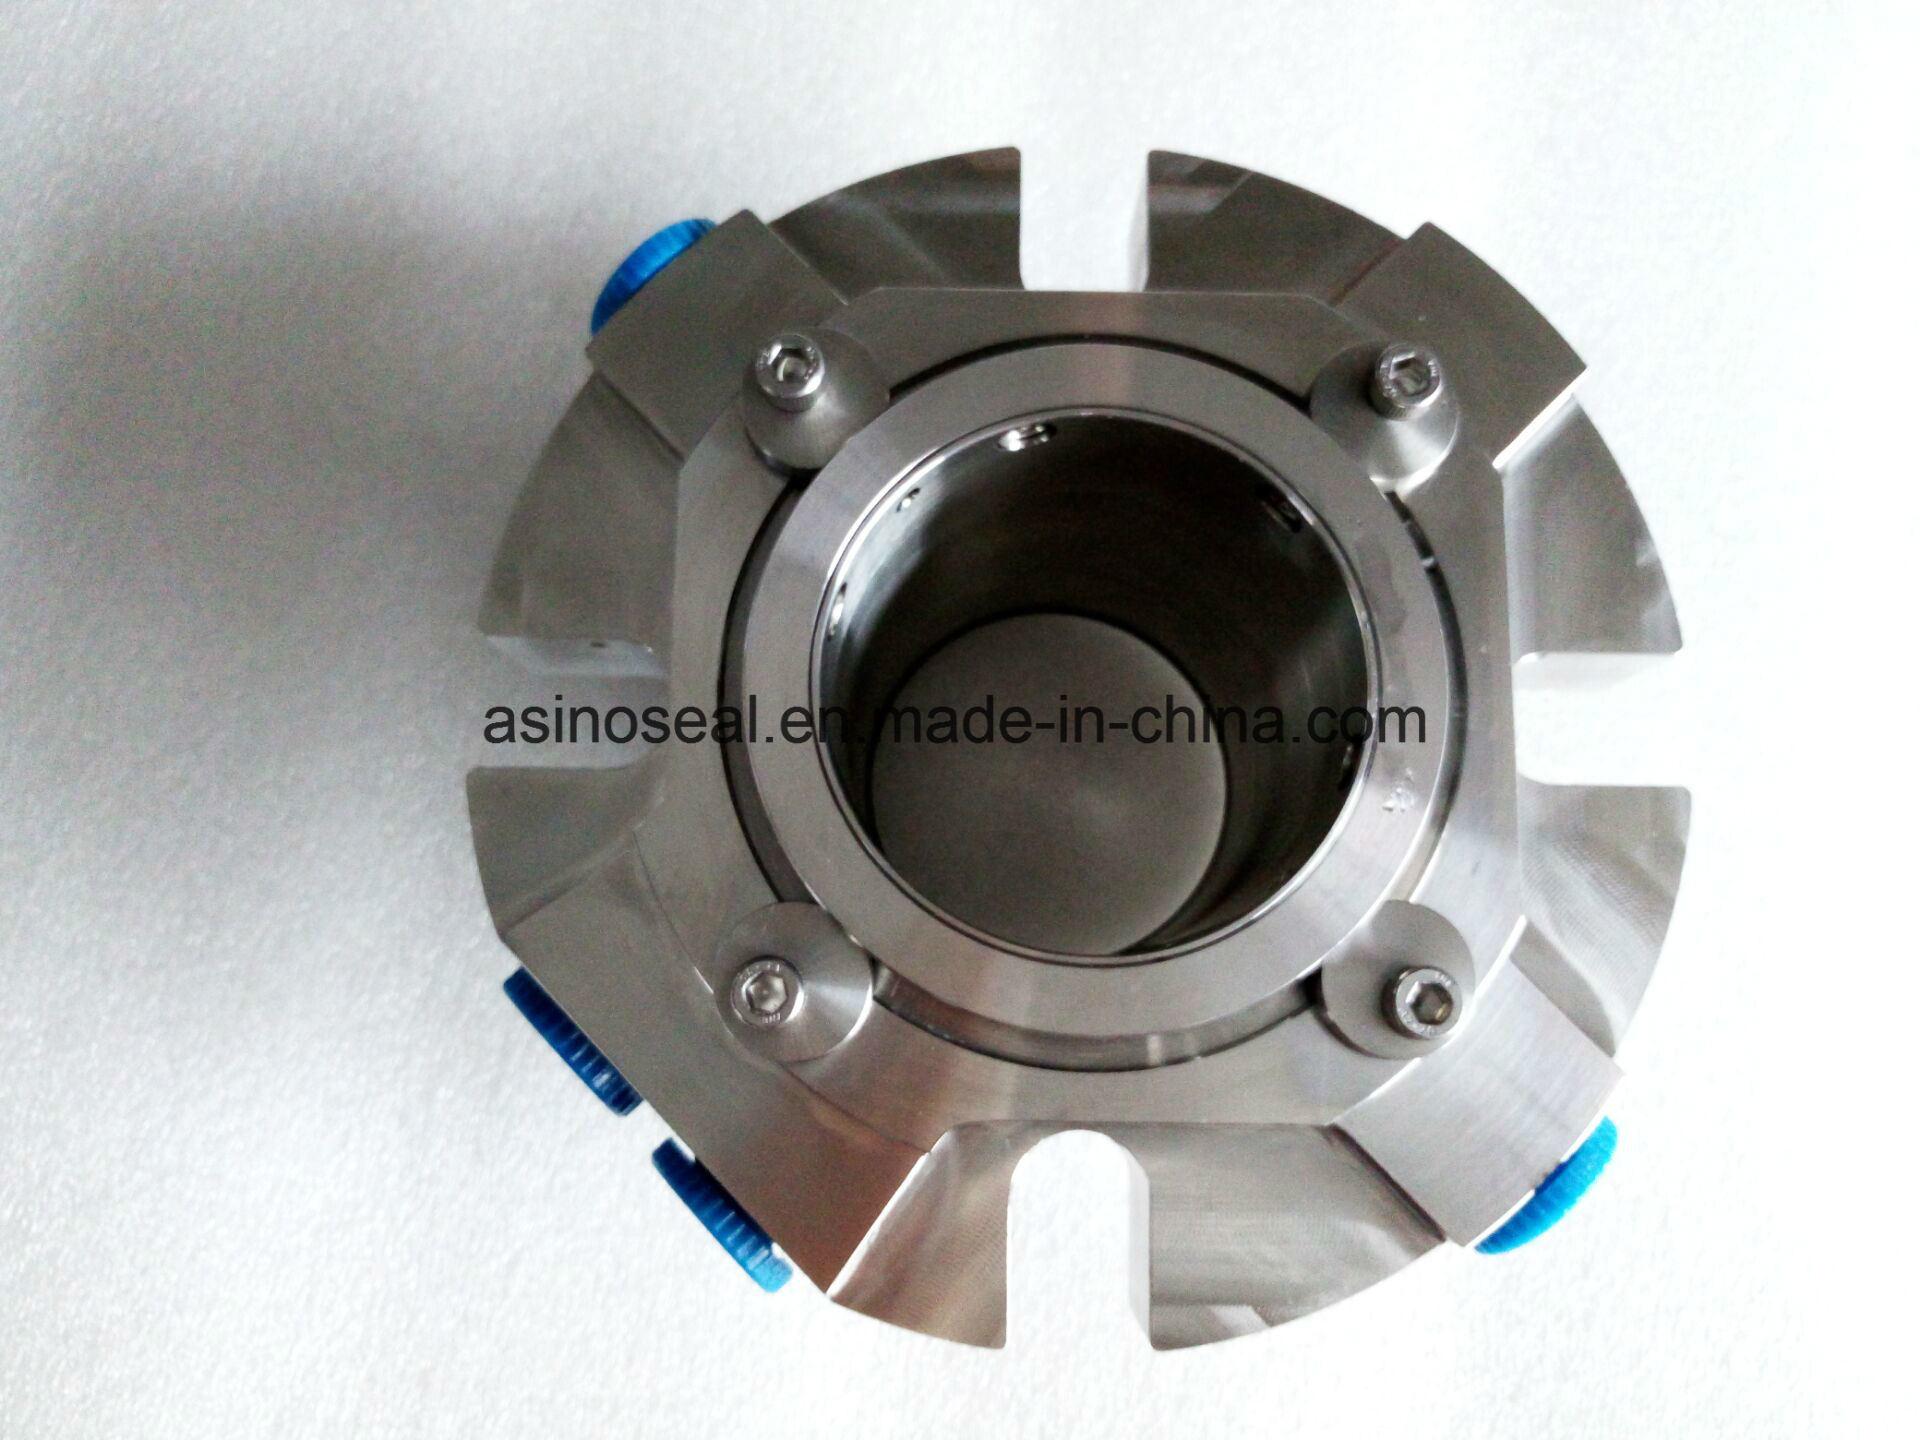 Chesterton S20 Mechanical Seal